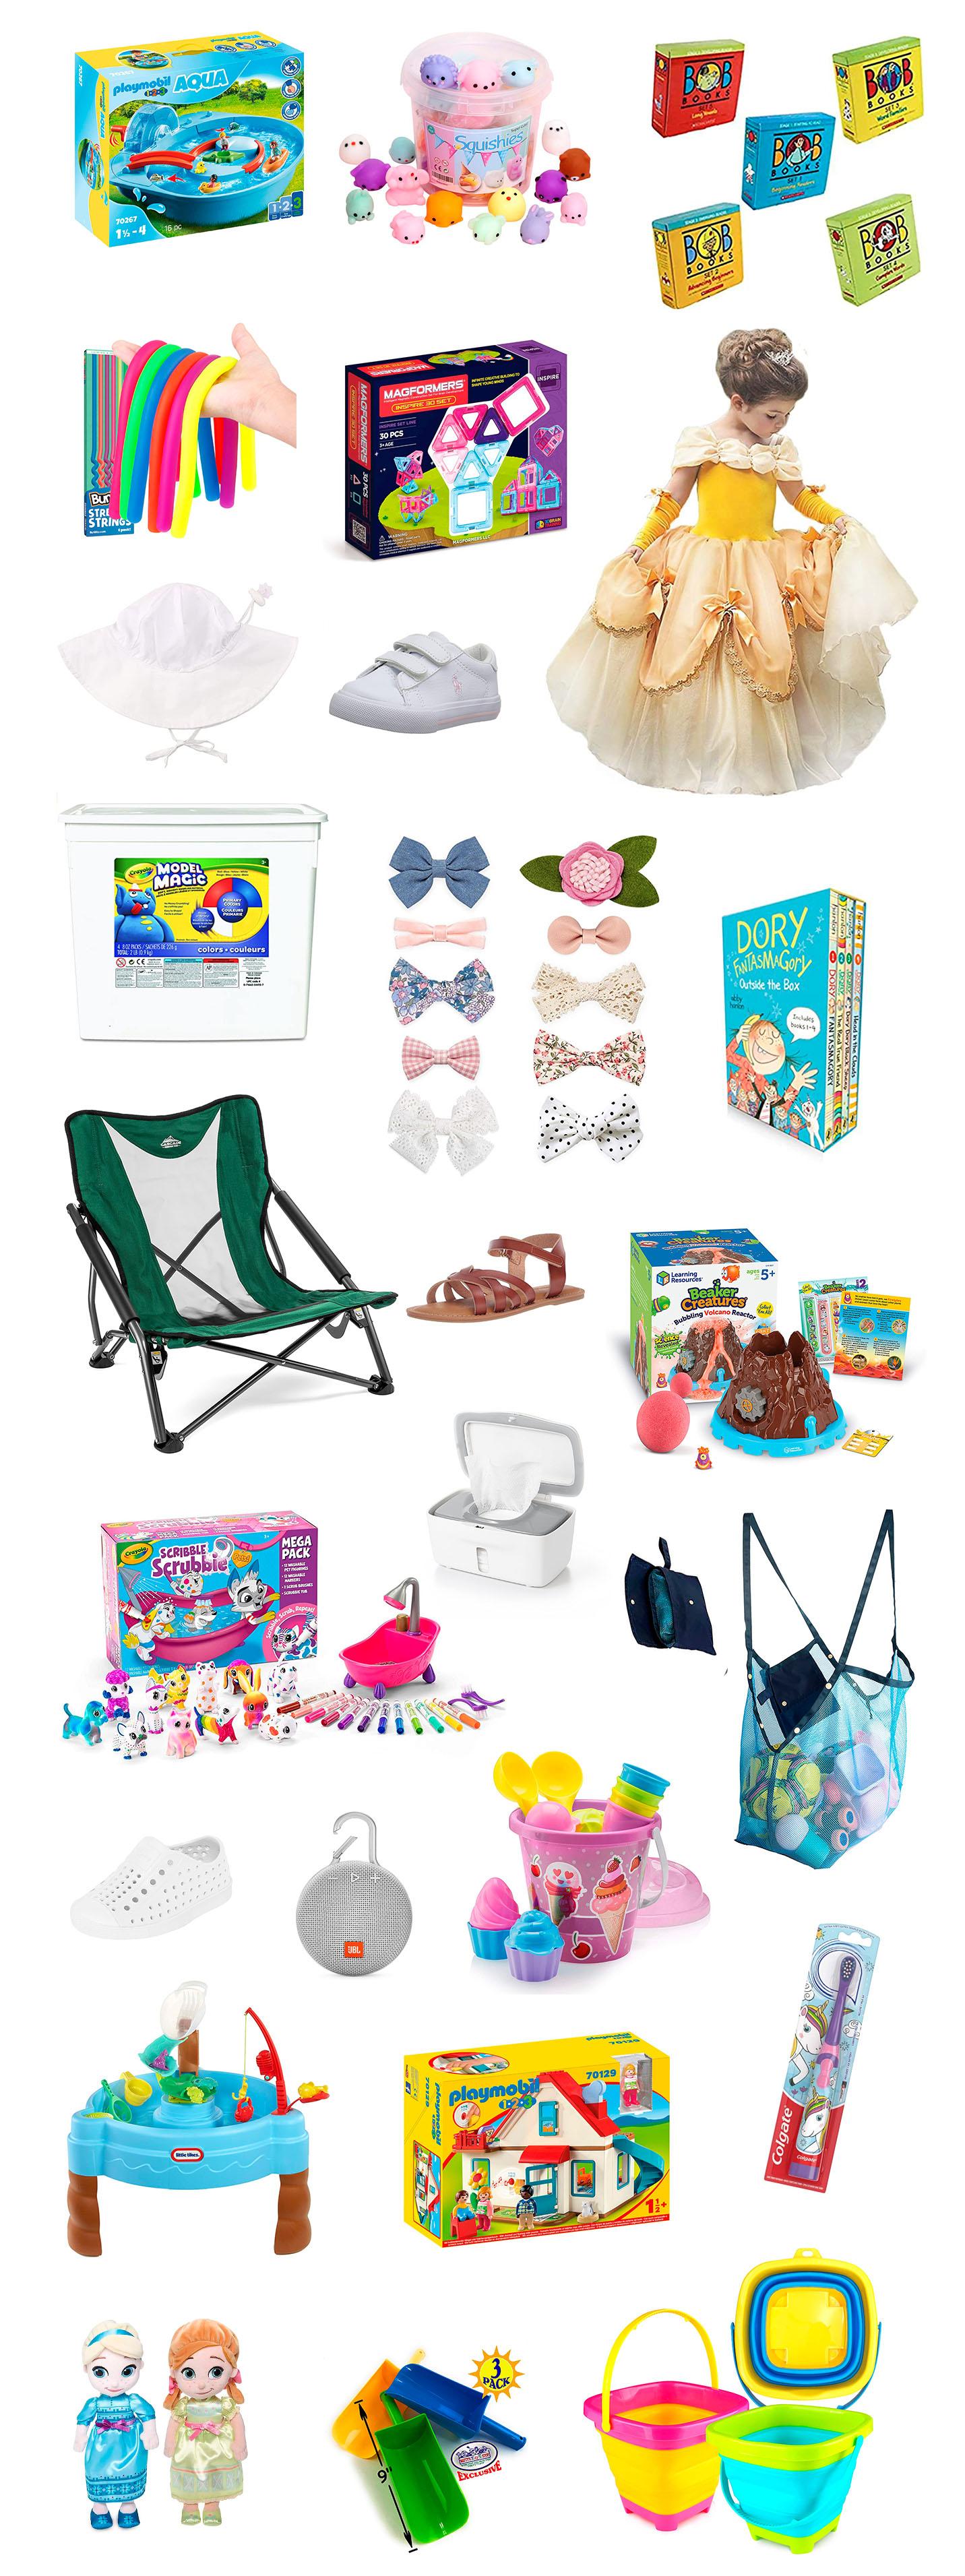 Favorite Amazon Kids' Products